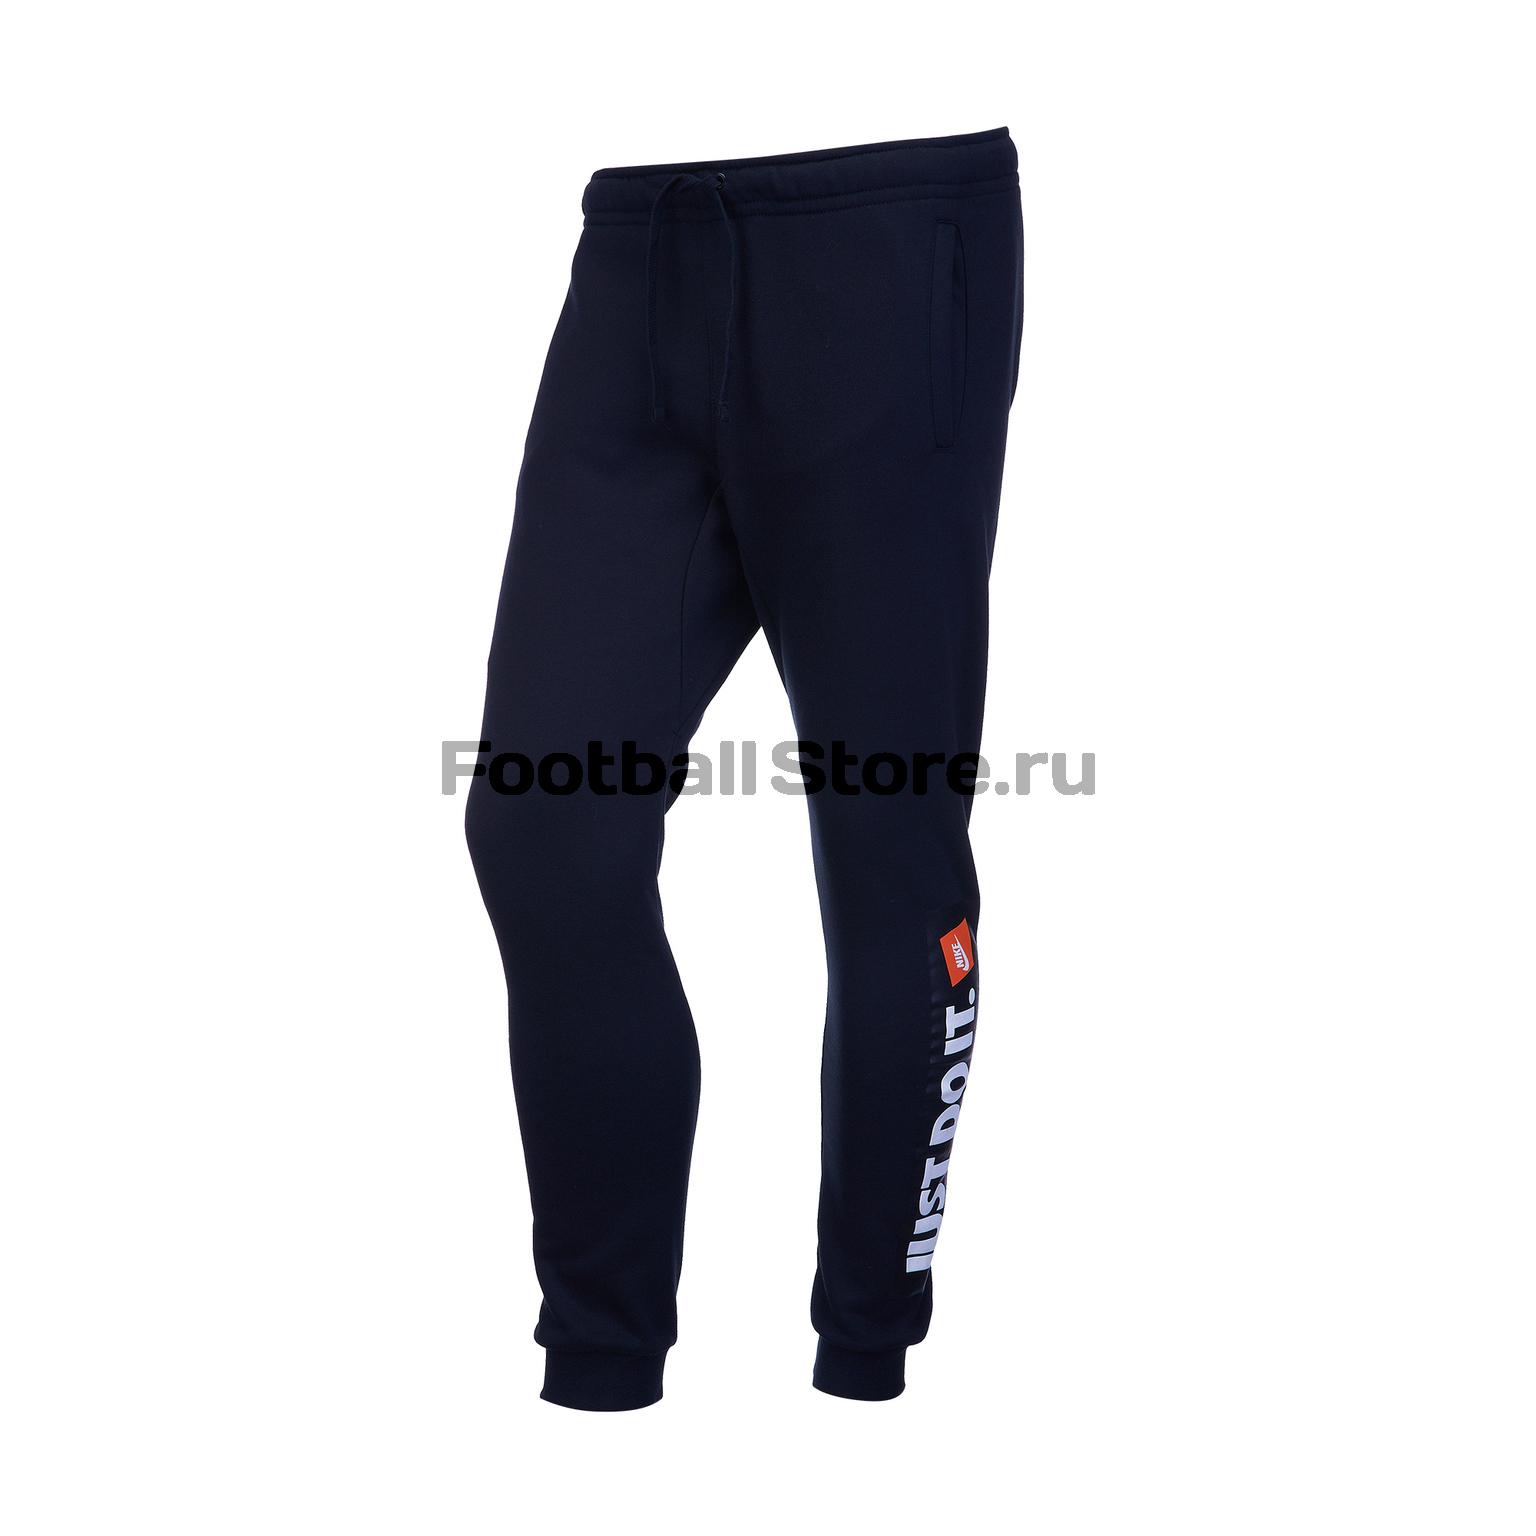 Брюки тренировочные Nike Just Do It NSW FLC 928725-010 брюки тренировочные nike m nsw jogger club flc 804408 063